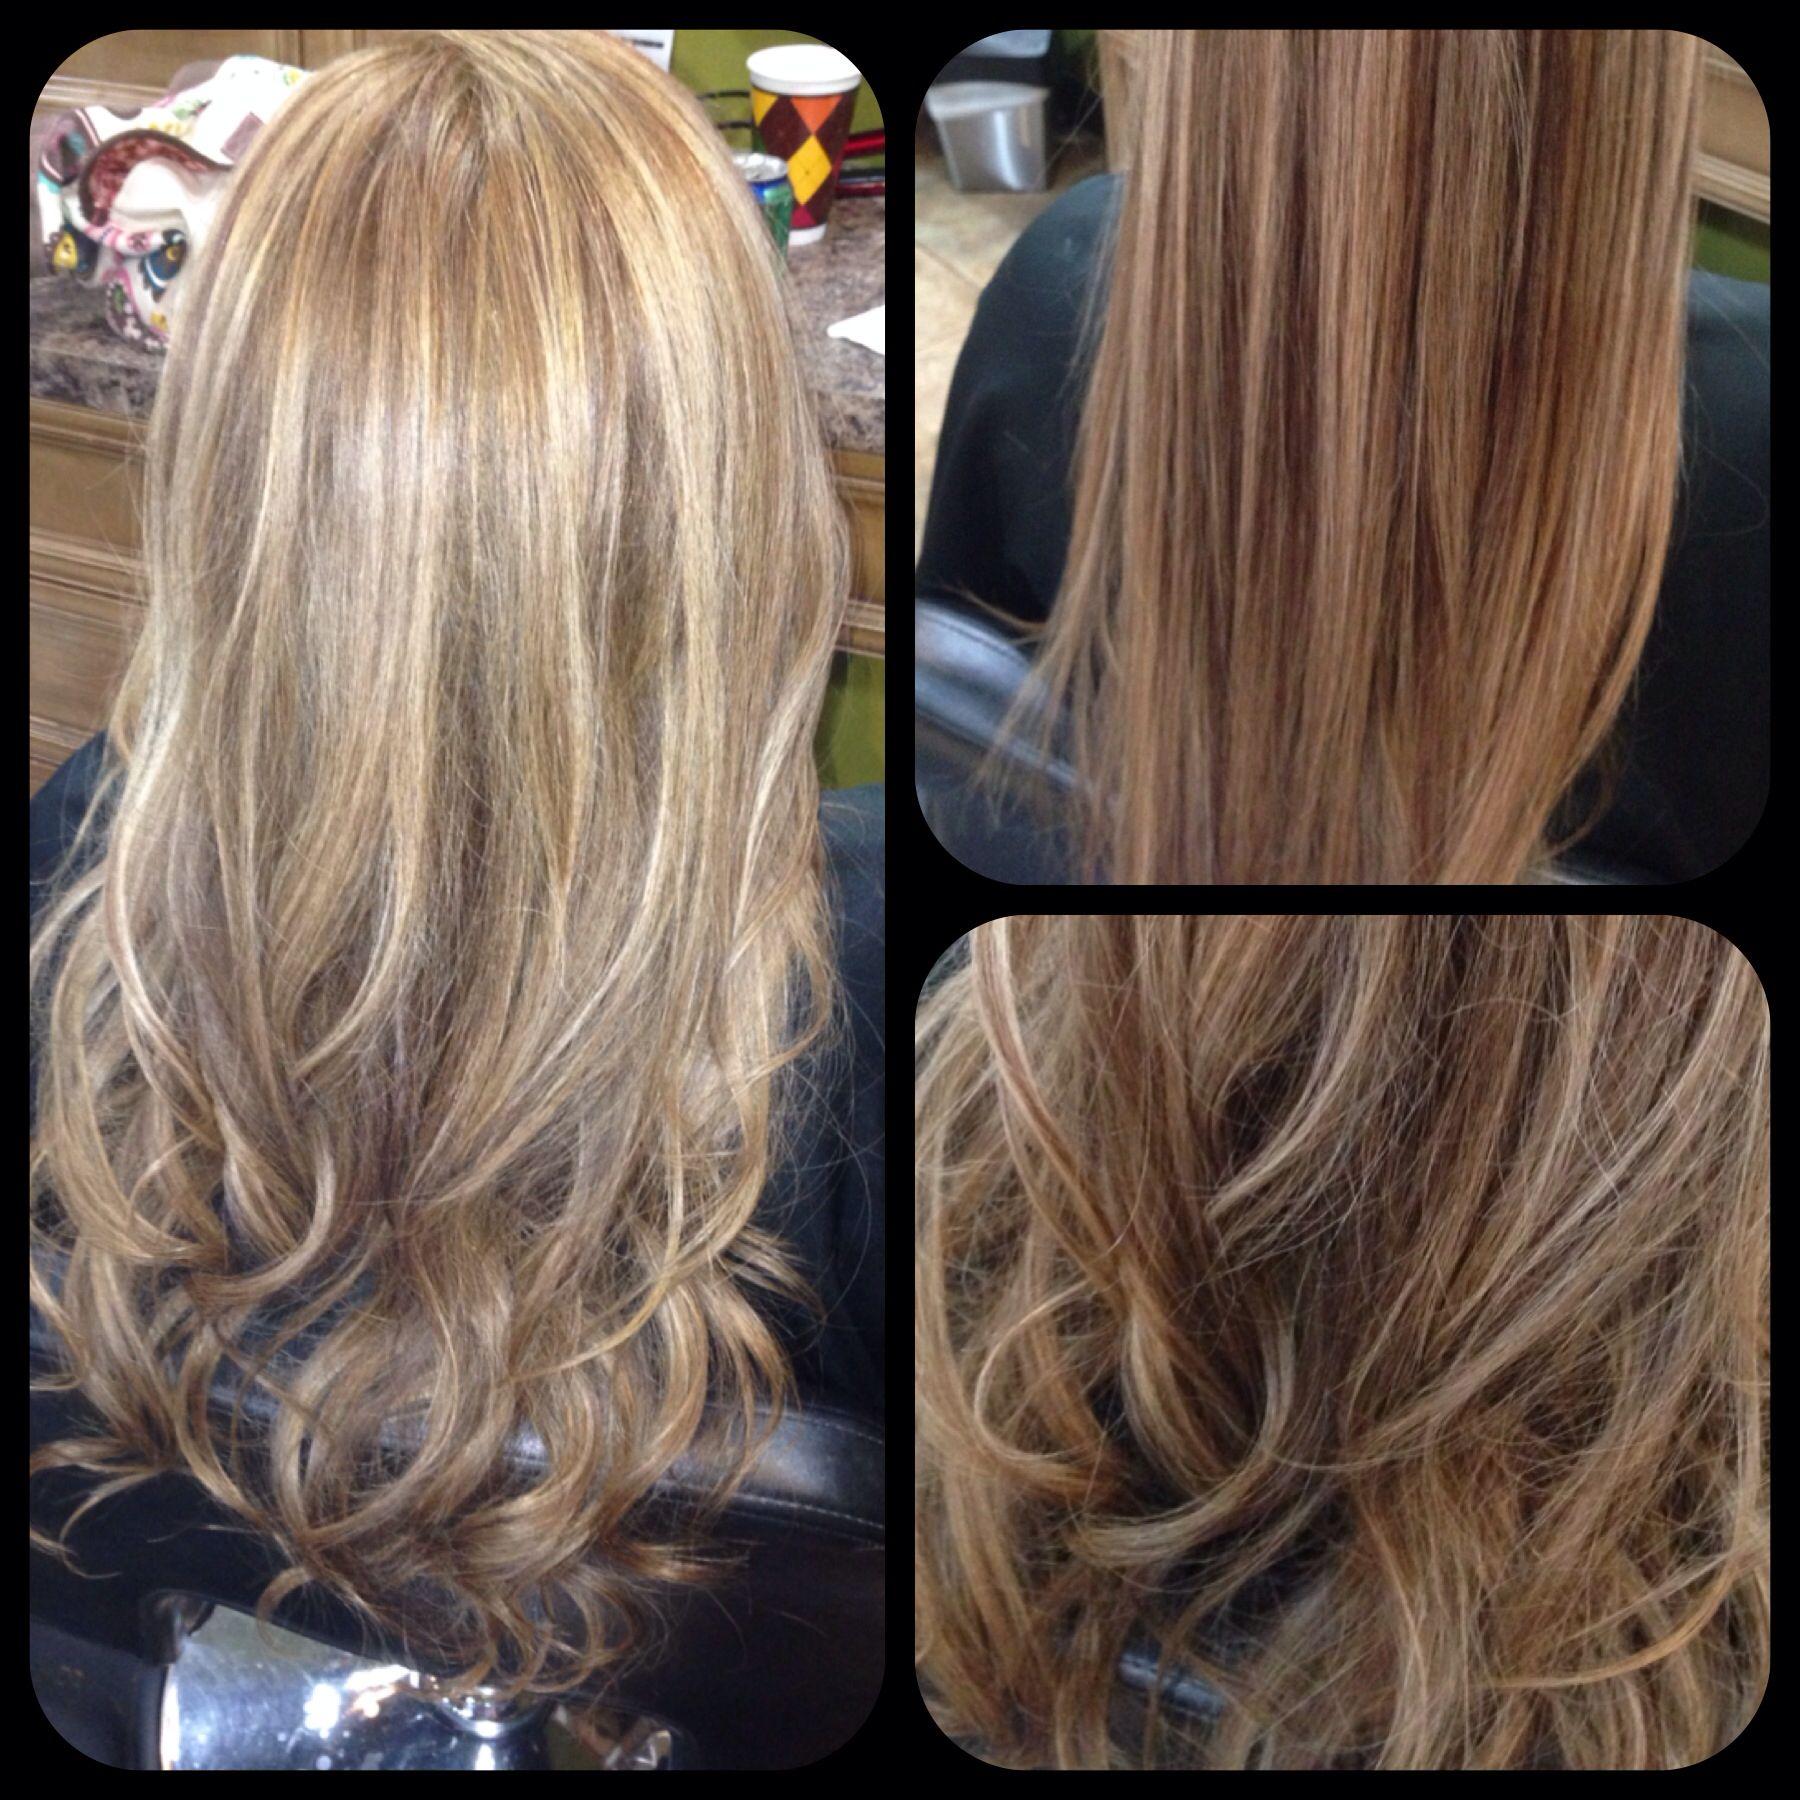 Blonde highlights ideas pinterest - Caramel Base With Blonde Chunky Highlights